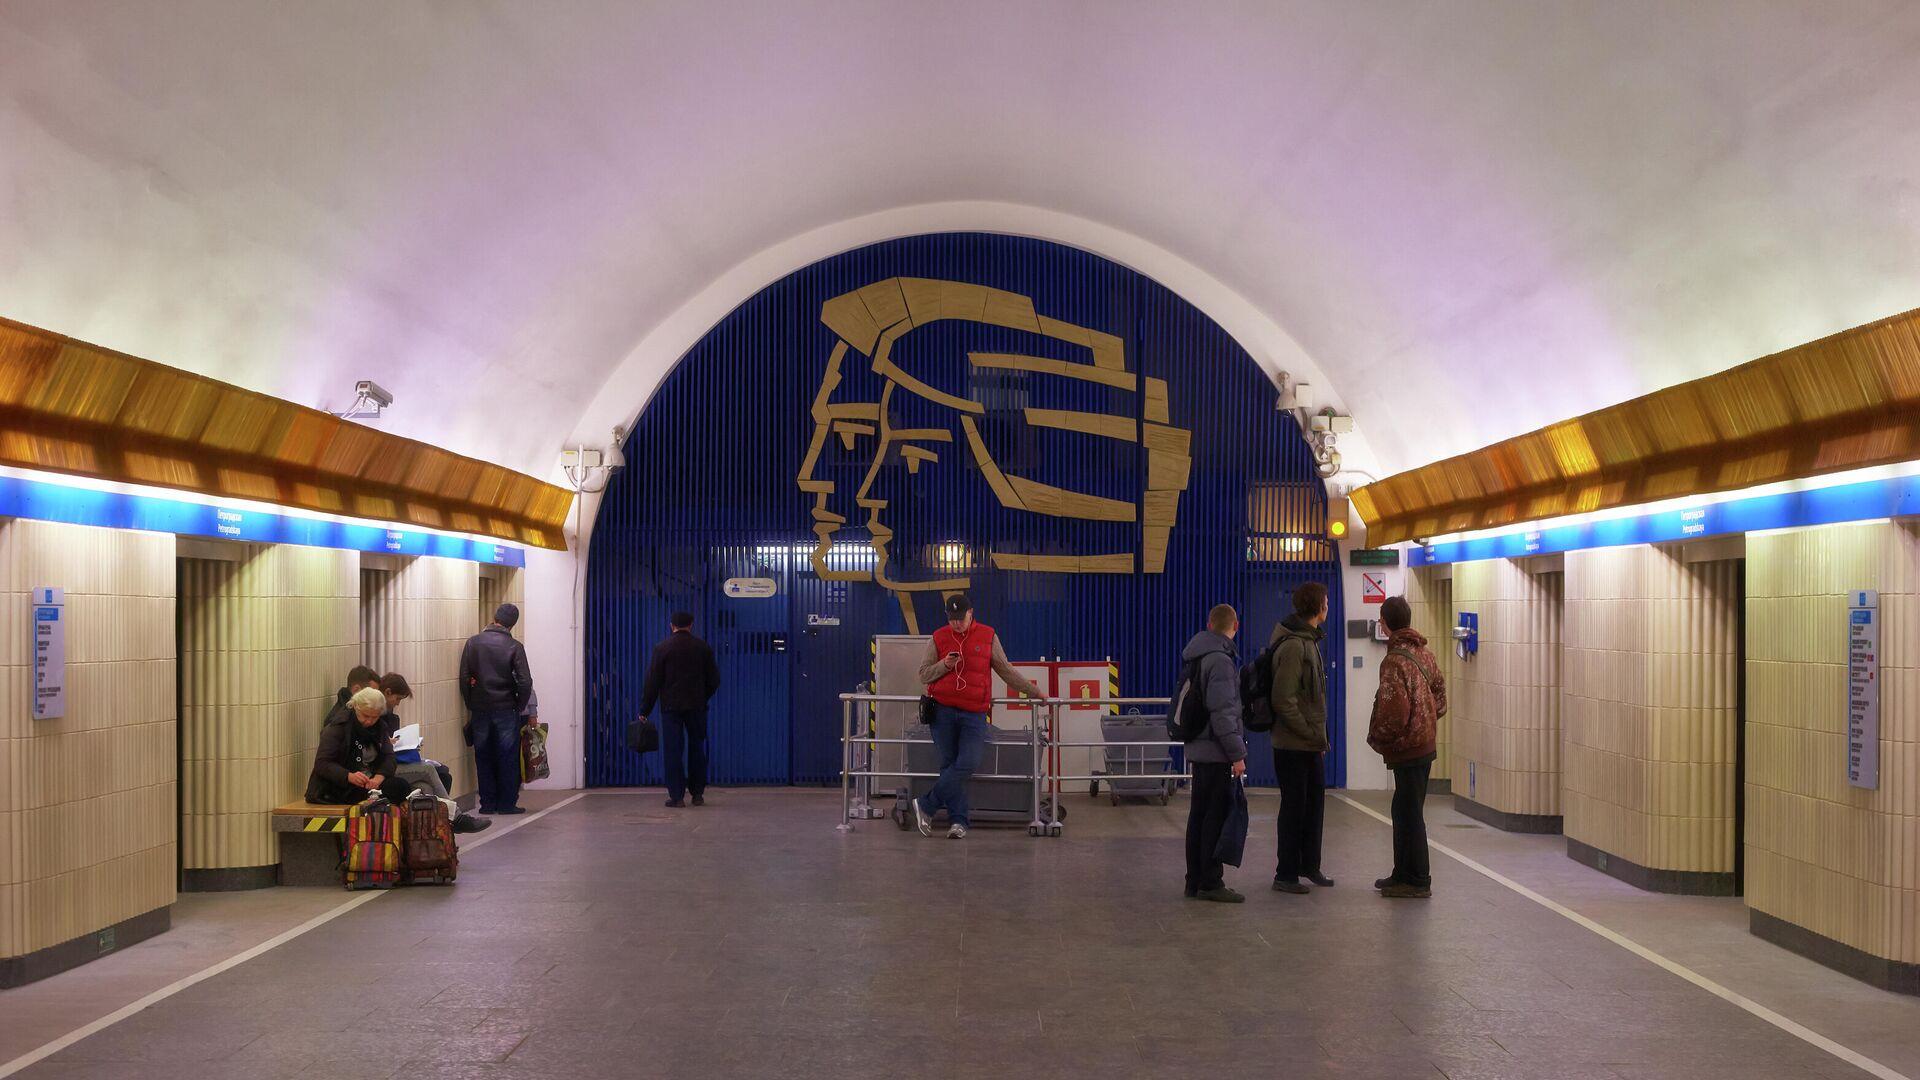 Пассажиры на станции метро Петроградская - РИА Новости, 1920, 22.06.2021